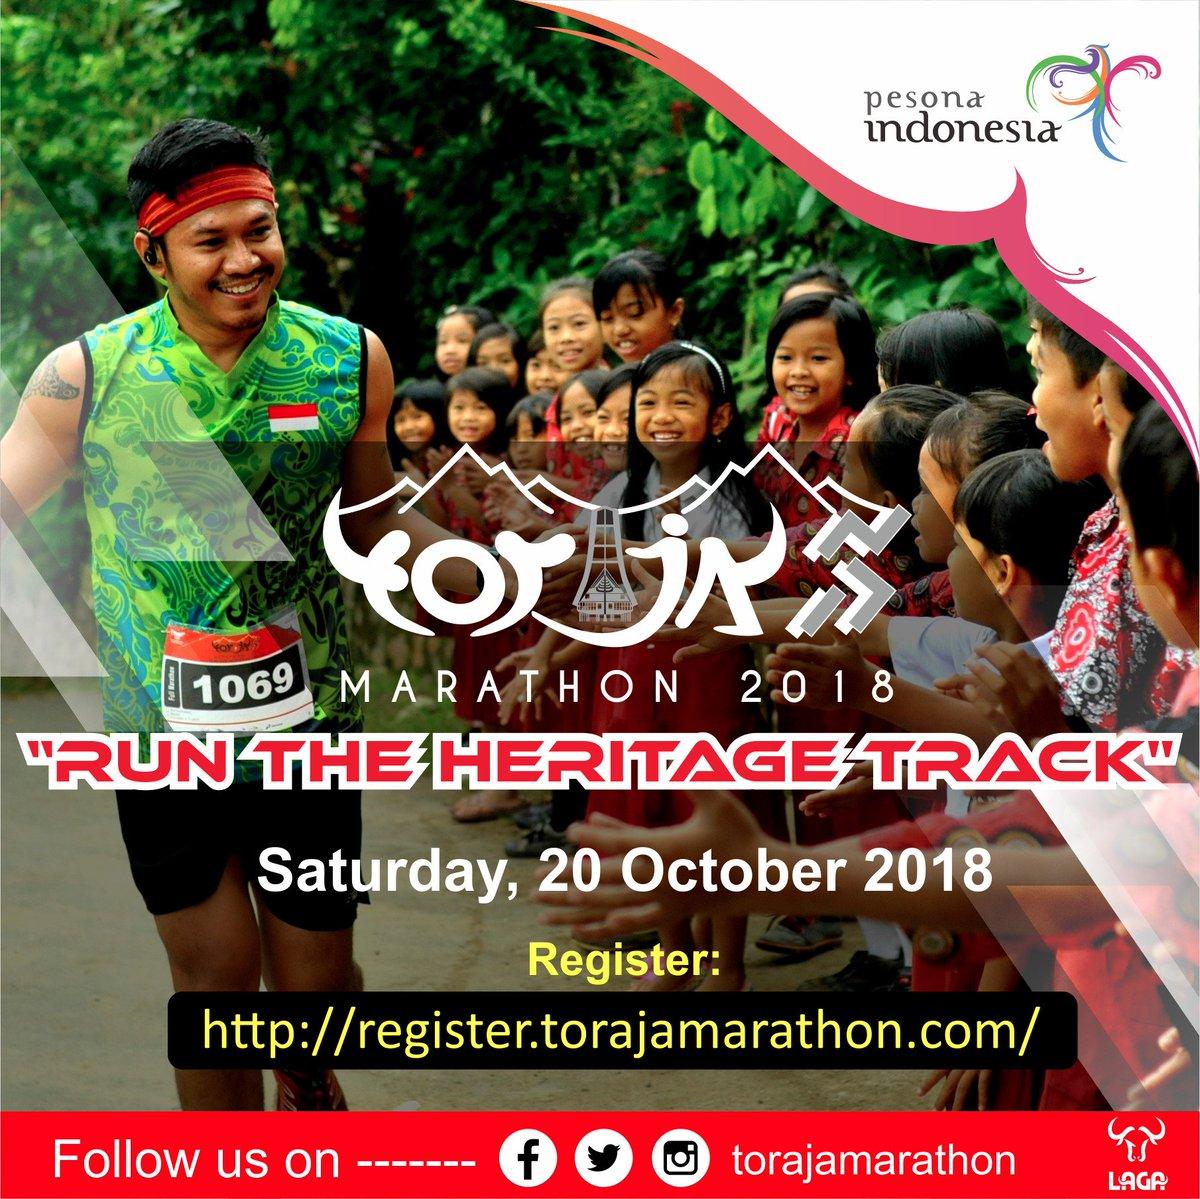 Toraja Marathon • 2018